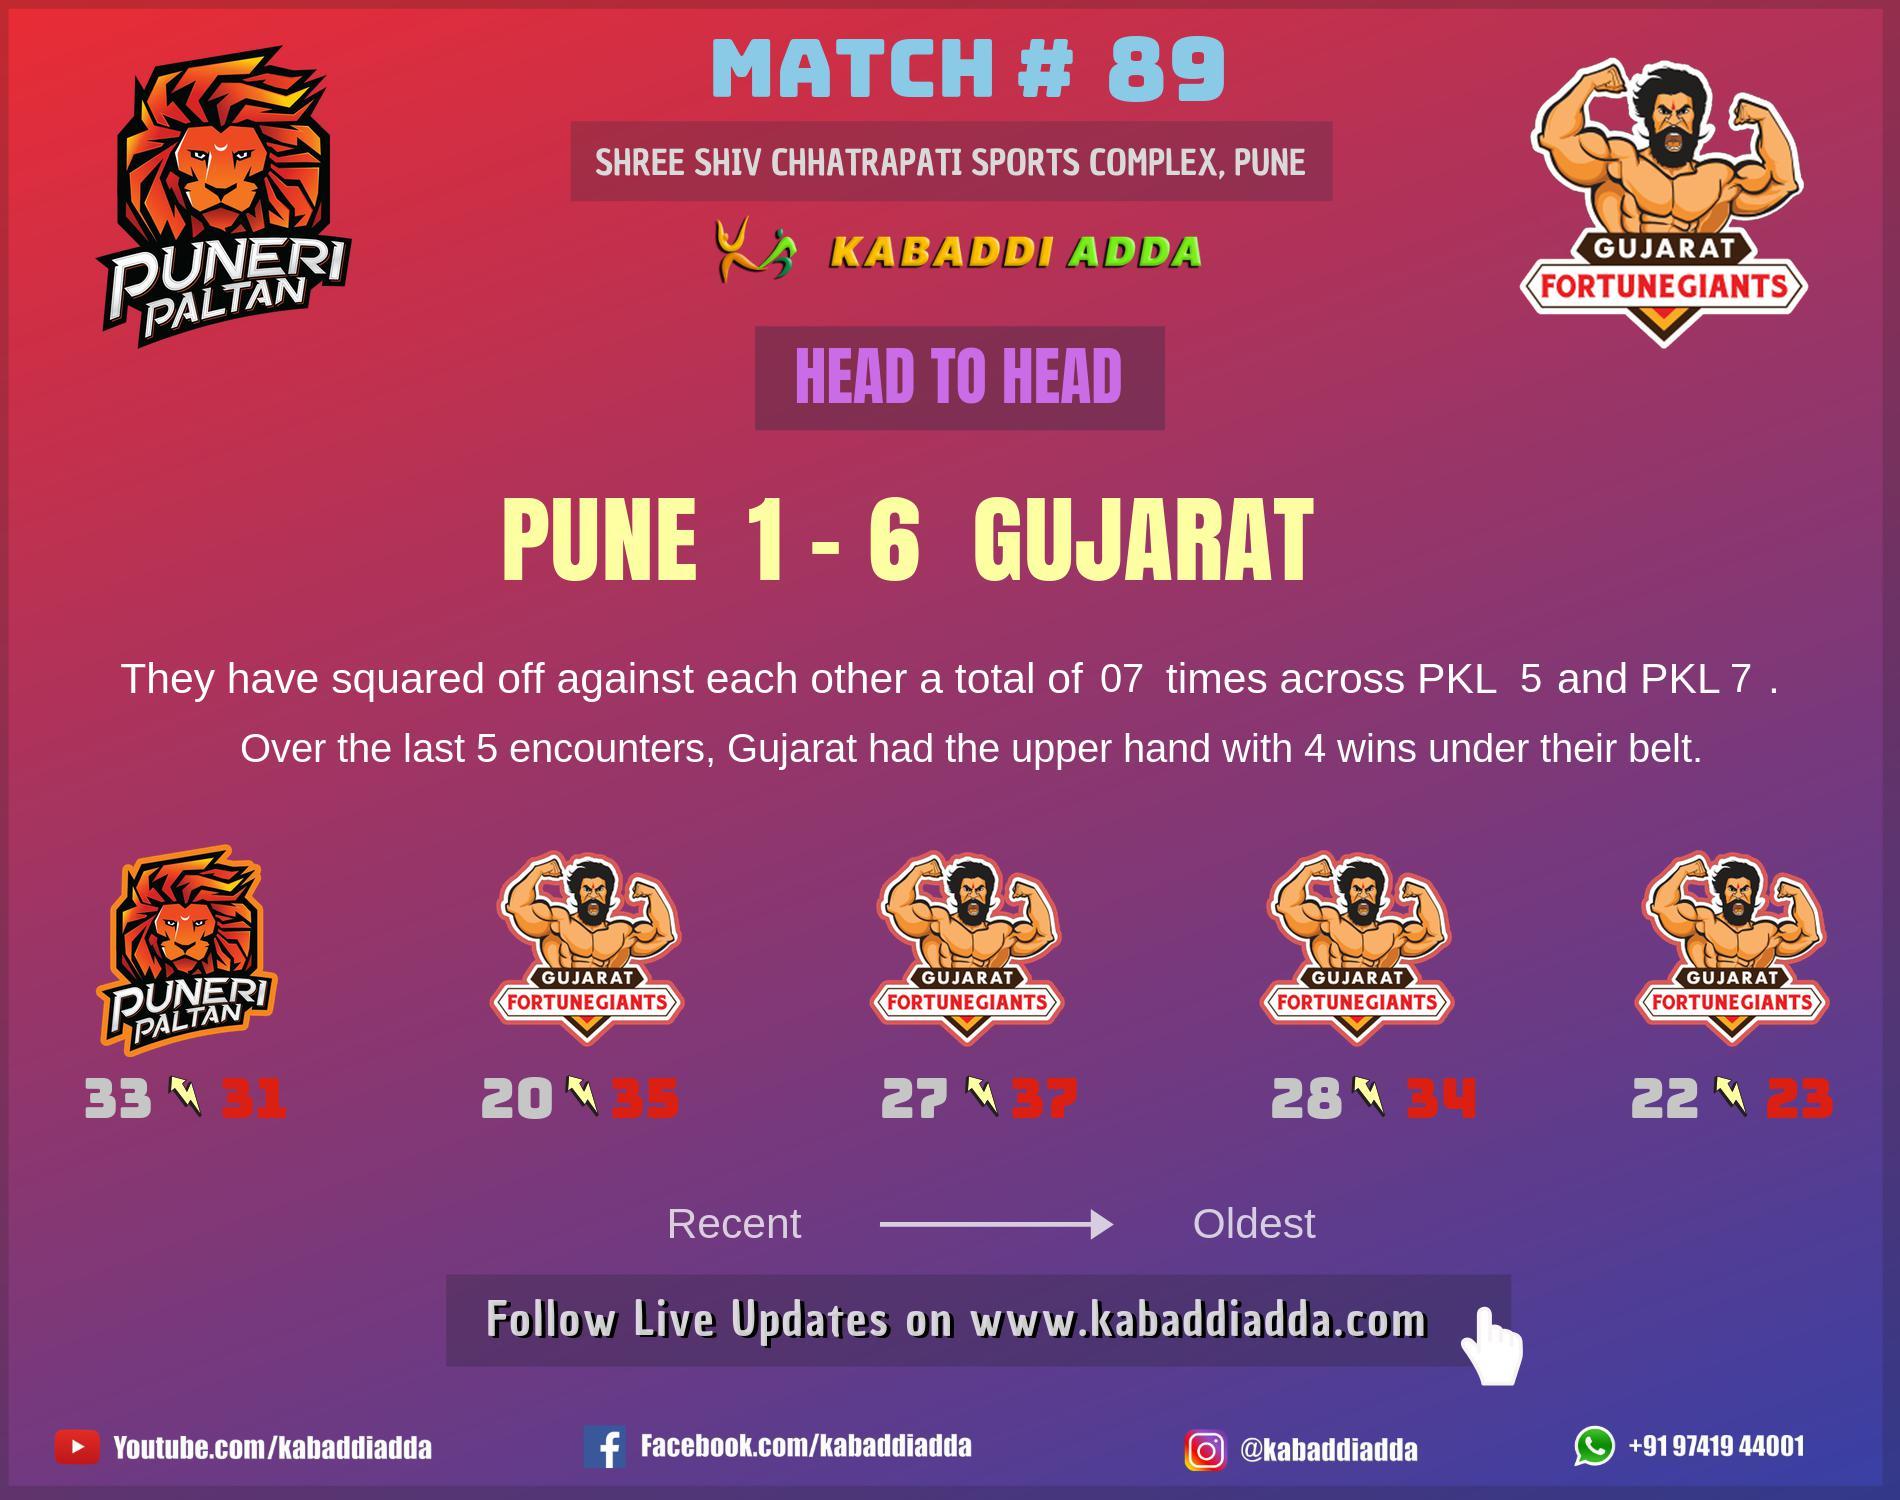 Puneri Paltan andGujarat Fortunegaints